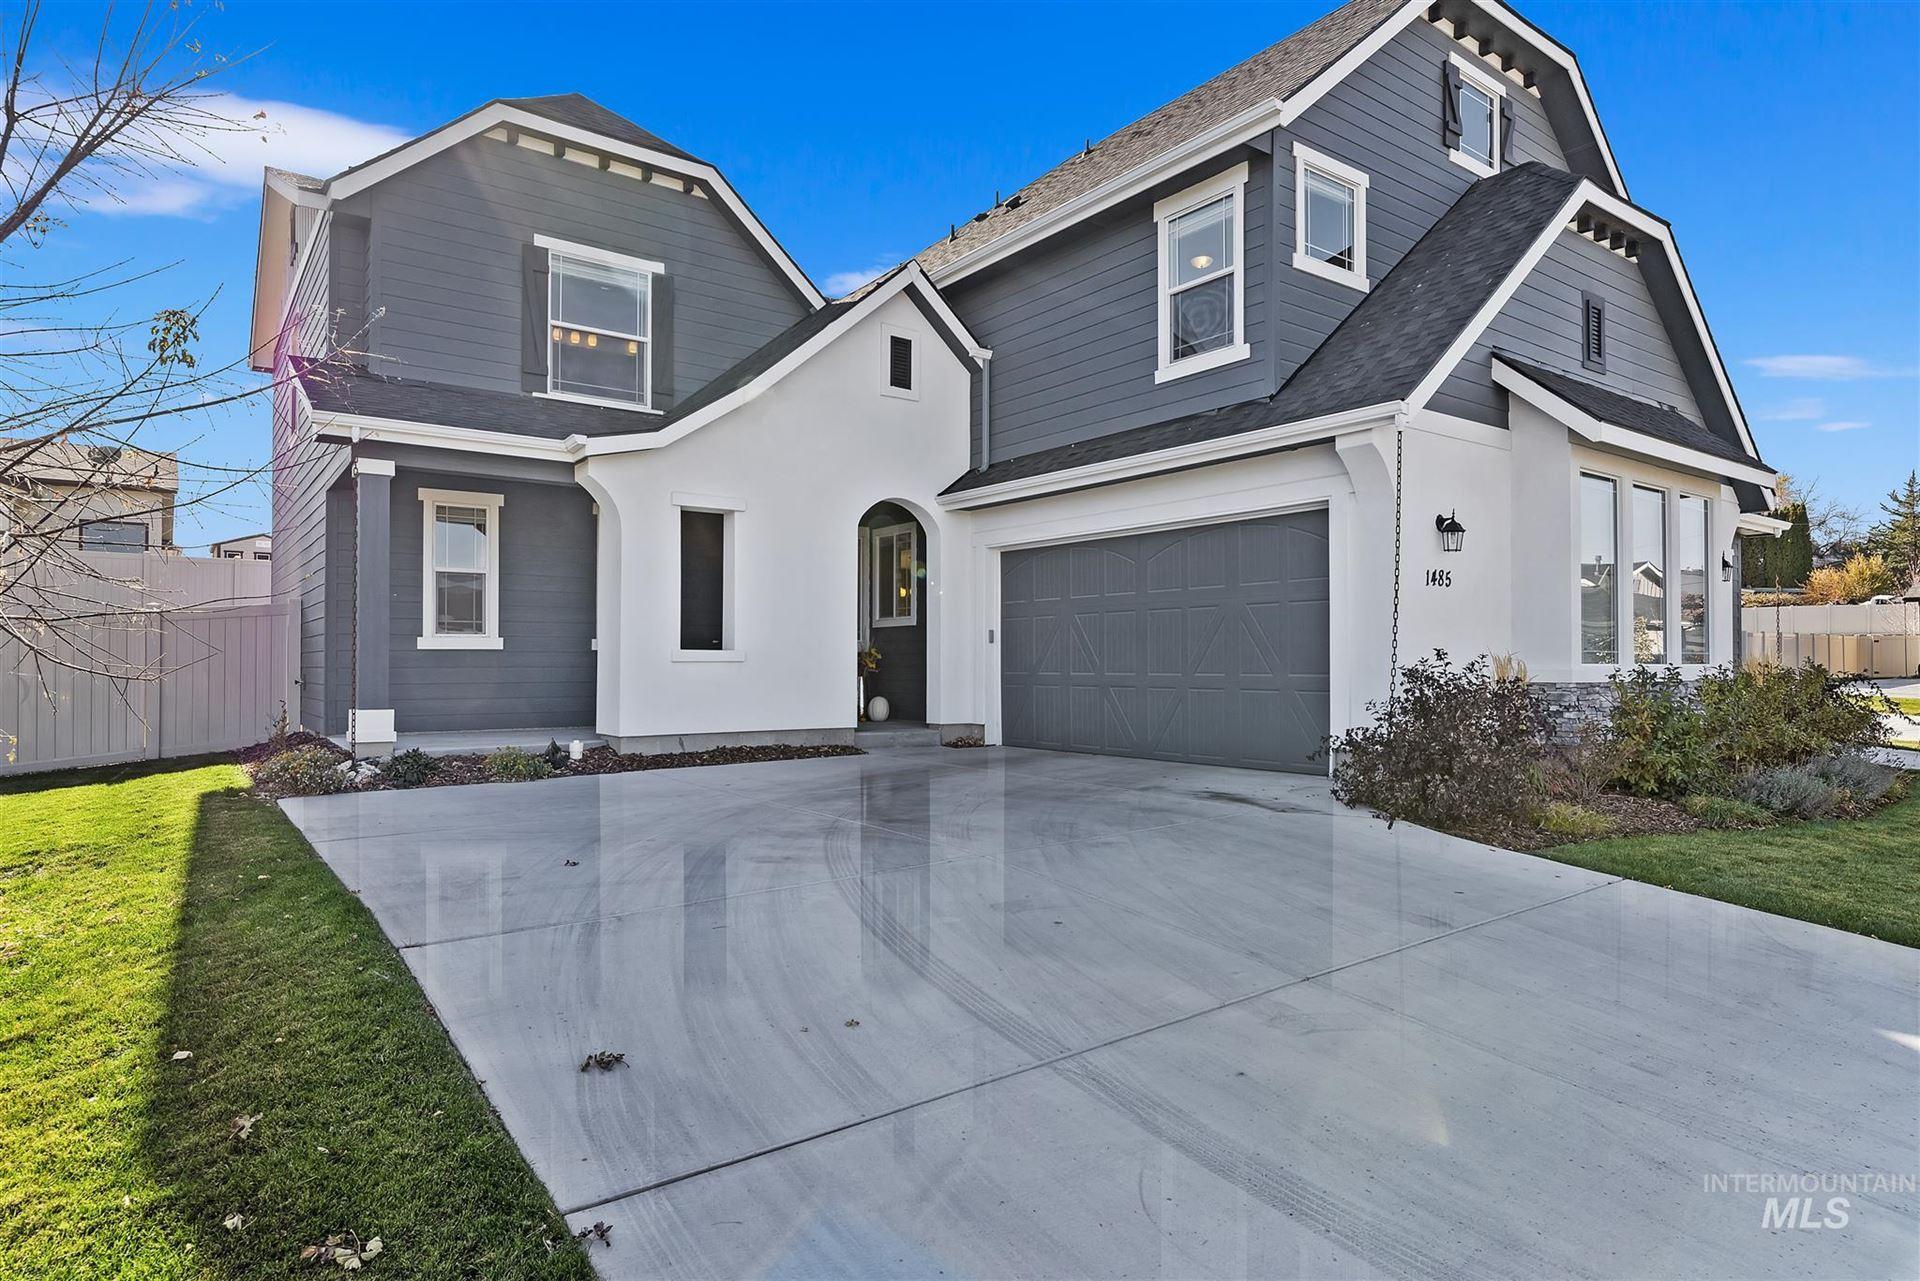 Photo of 1485 W Aspen Cove Dr., Meridian, ID 83642 (MLS # 98799779)